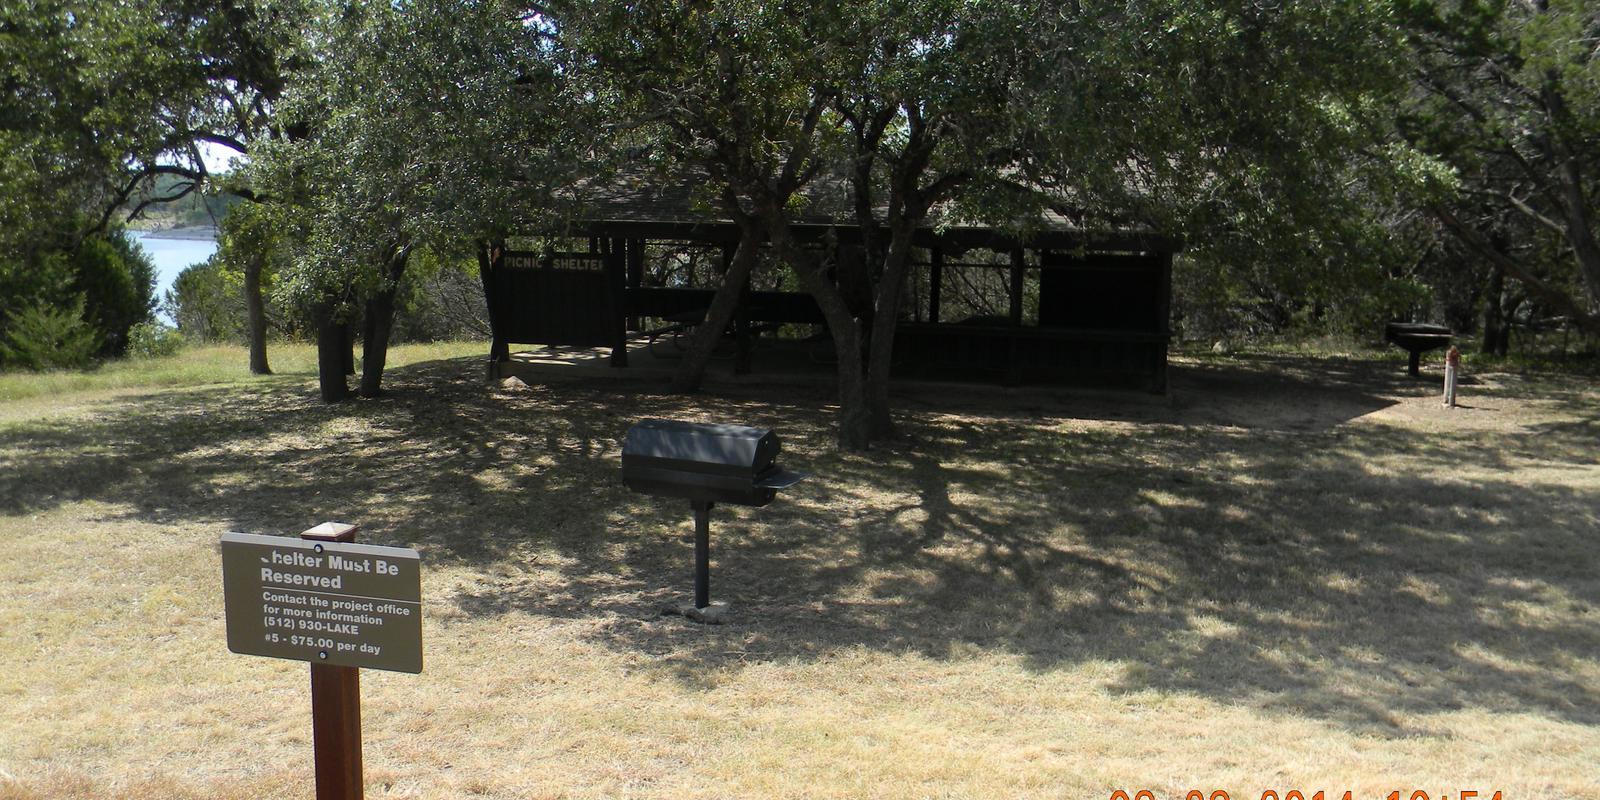 picnic shelter 5